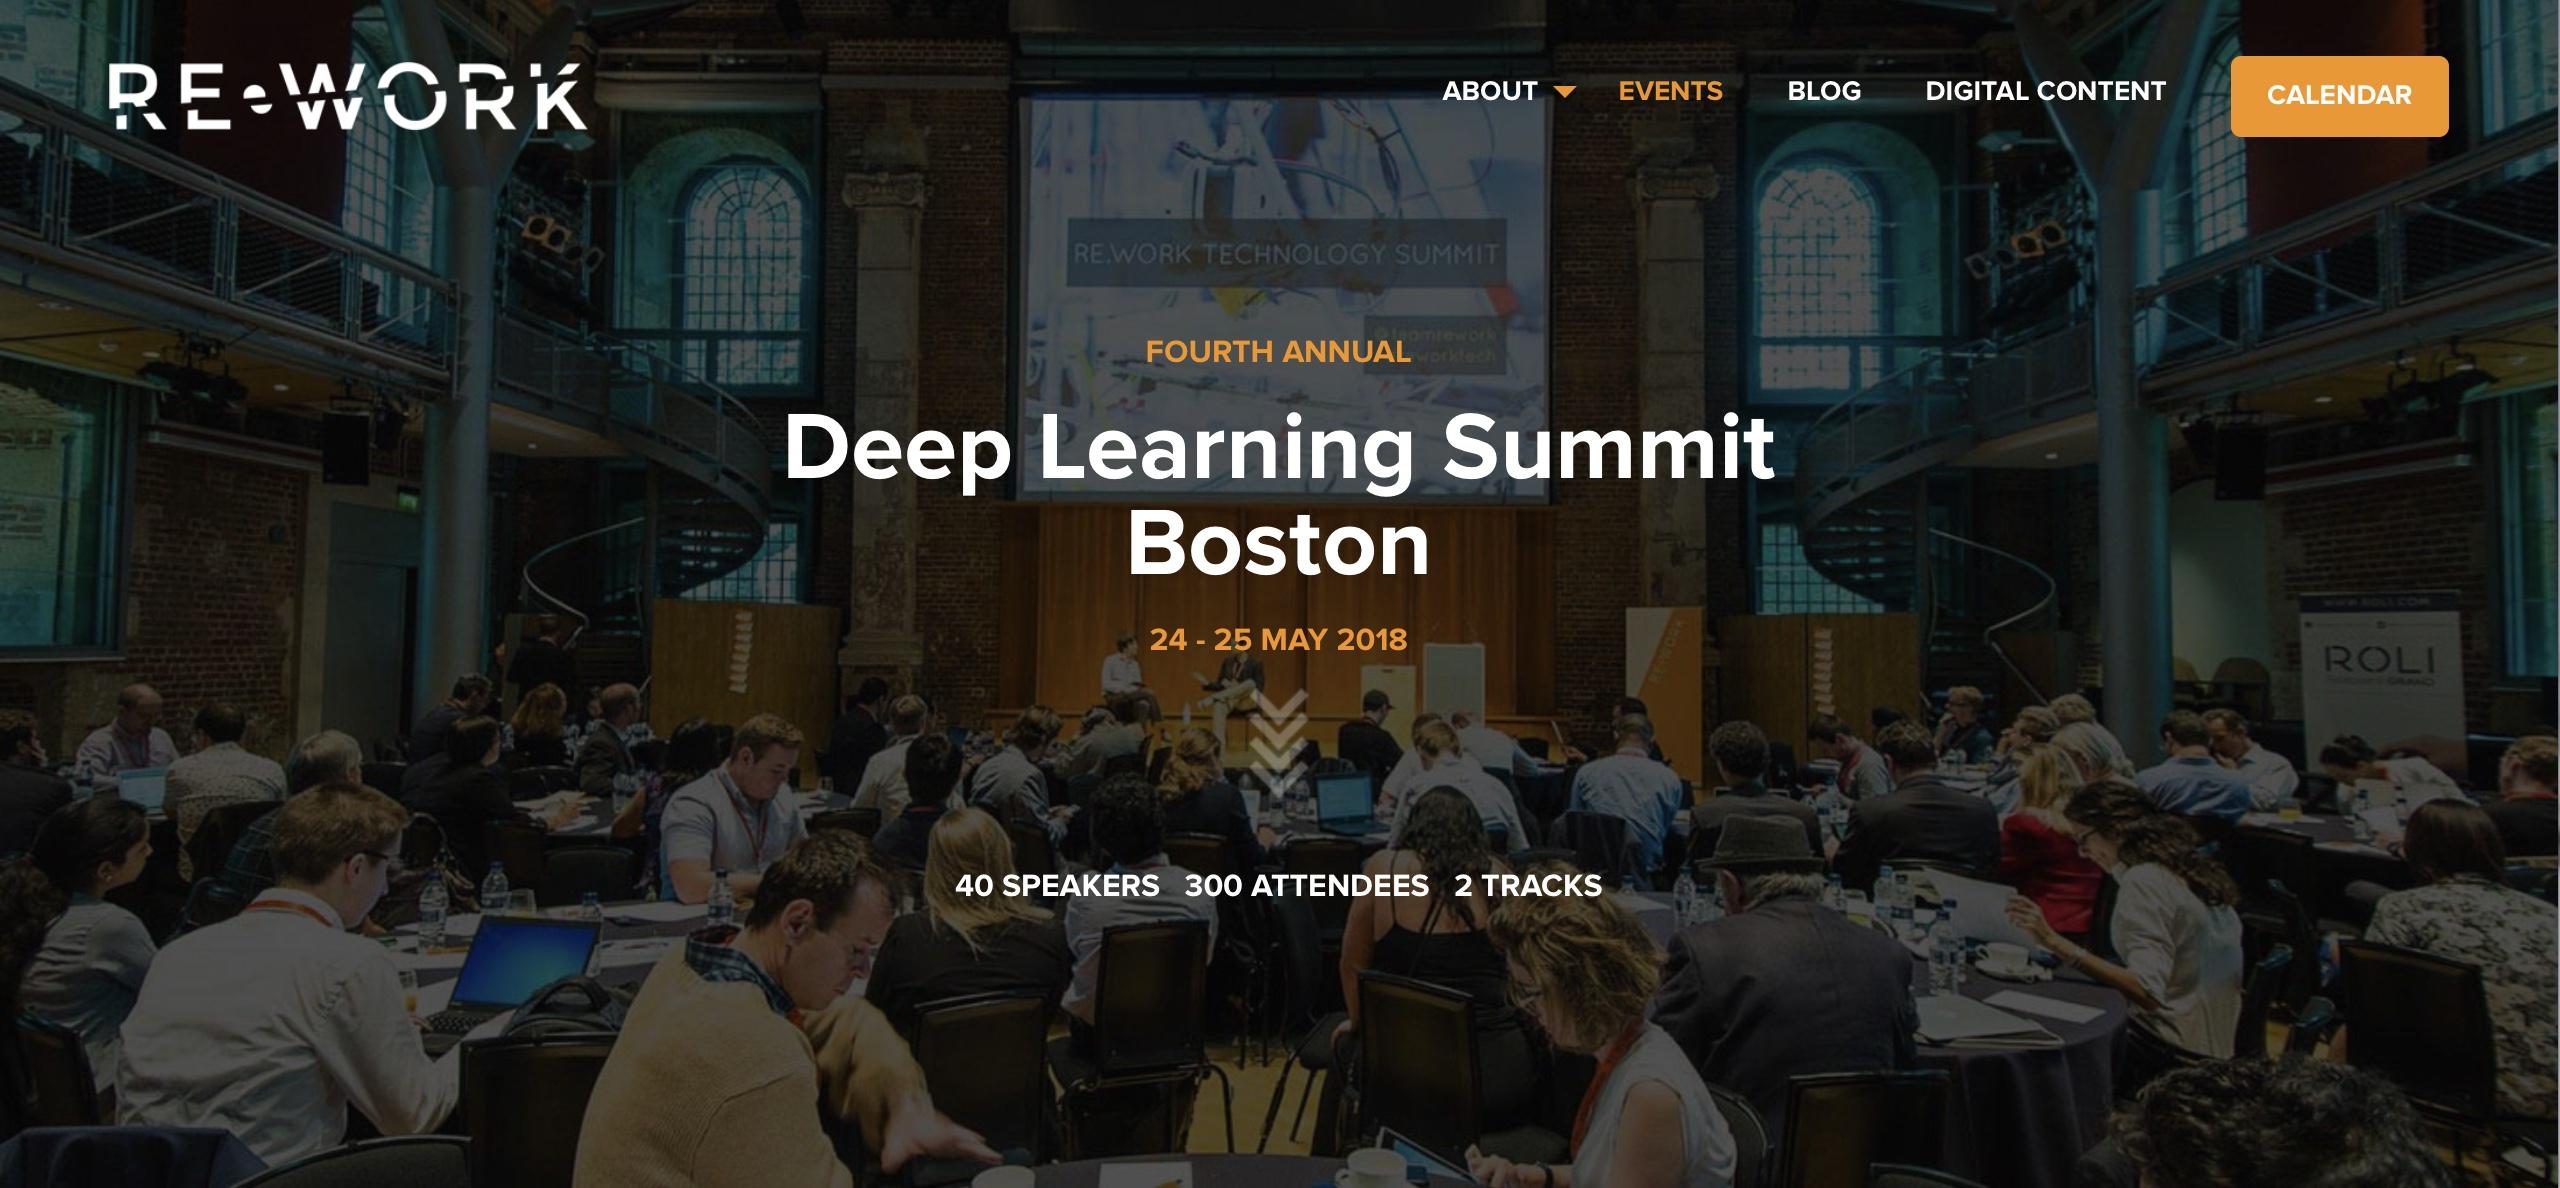 Boston, Re-Work Deep Learning Summit – 24-25.5.2018